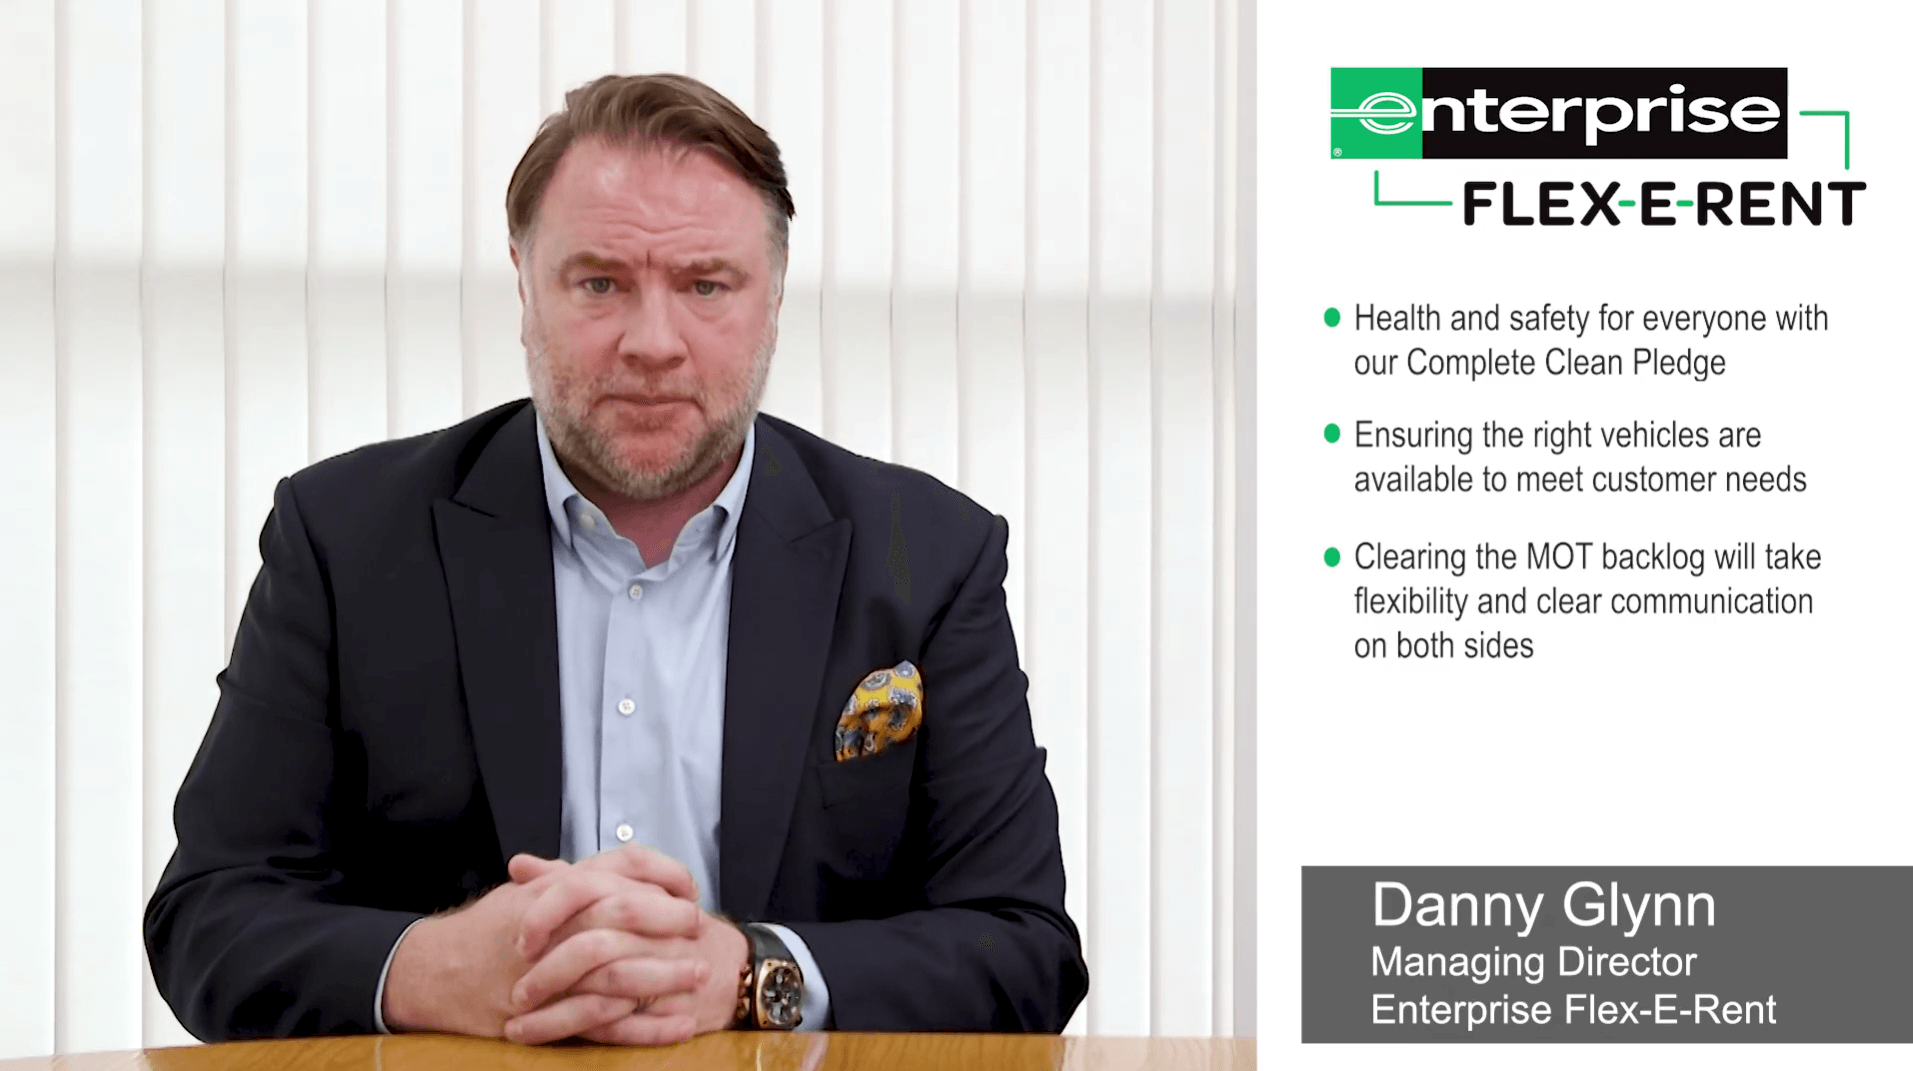 Danny Glynn, Managing Director of Enterprise Flex-E-Rent - August update